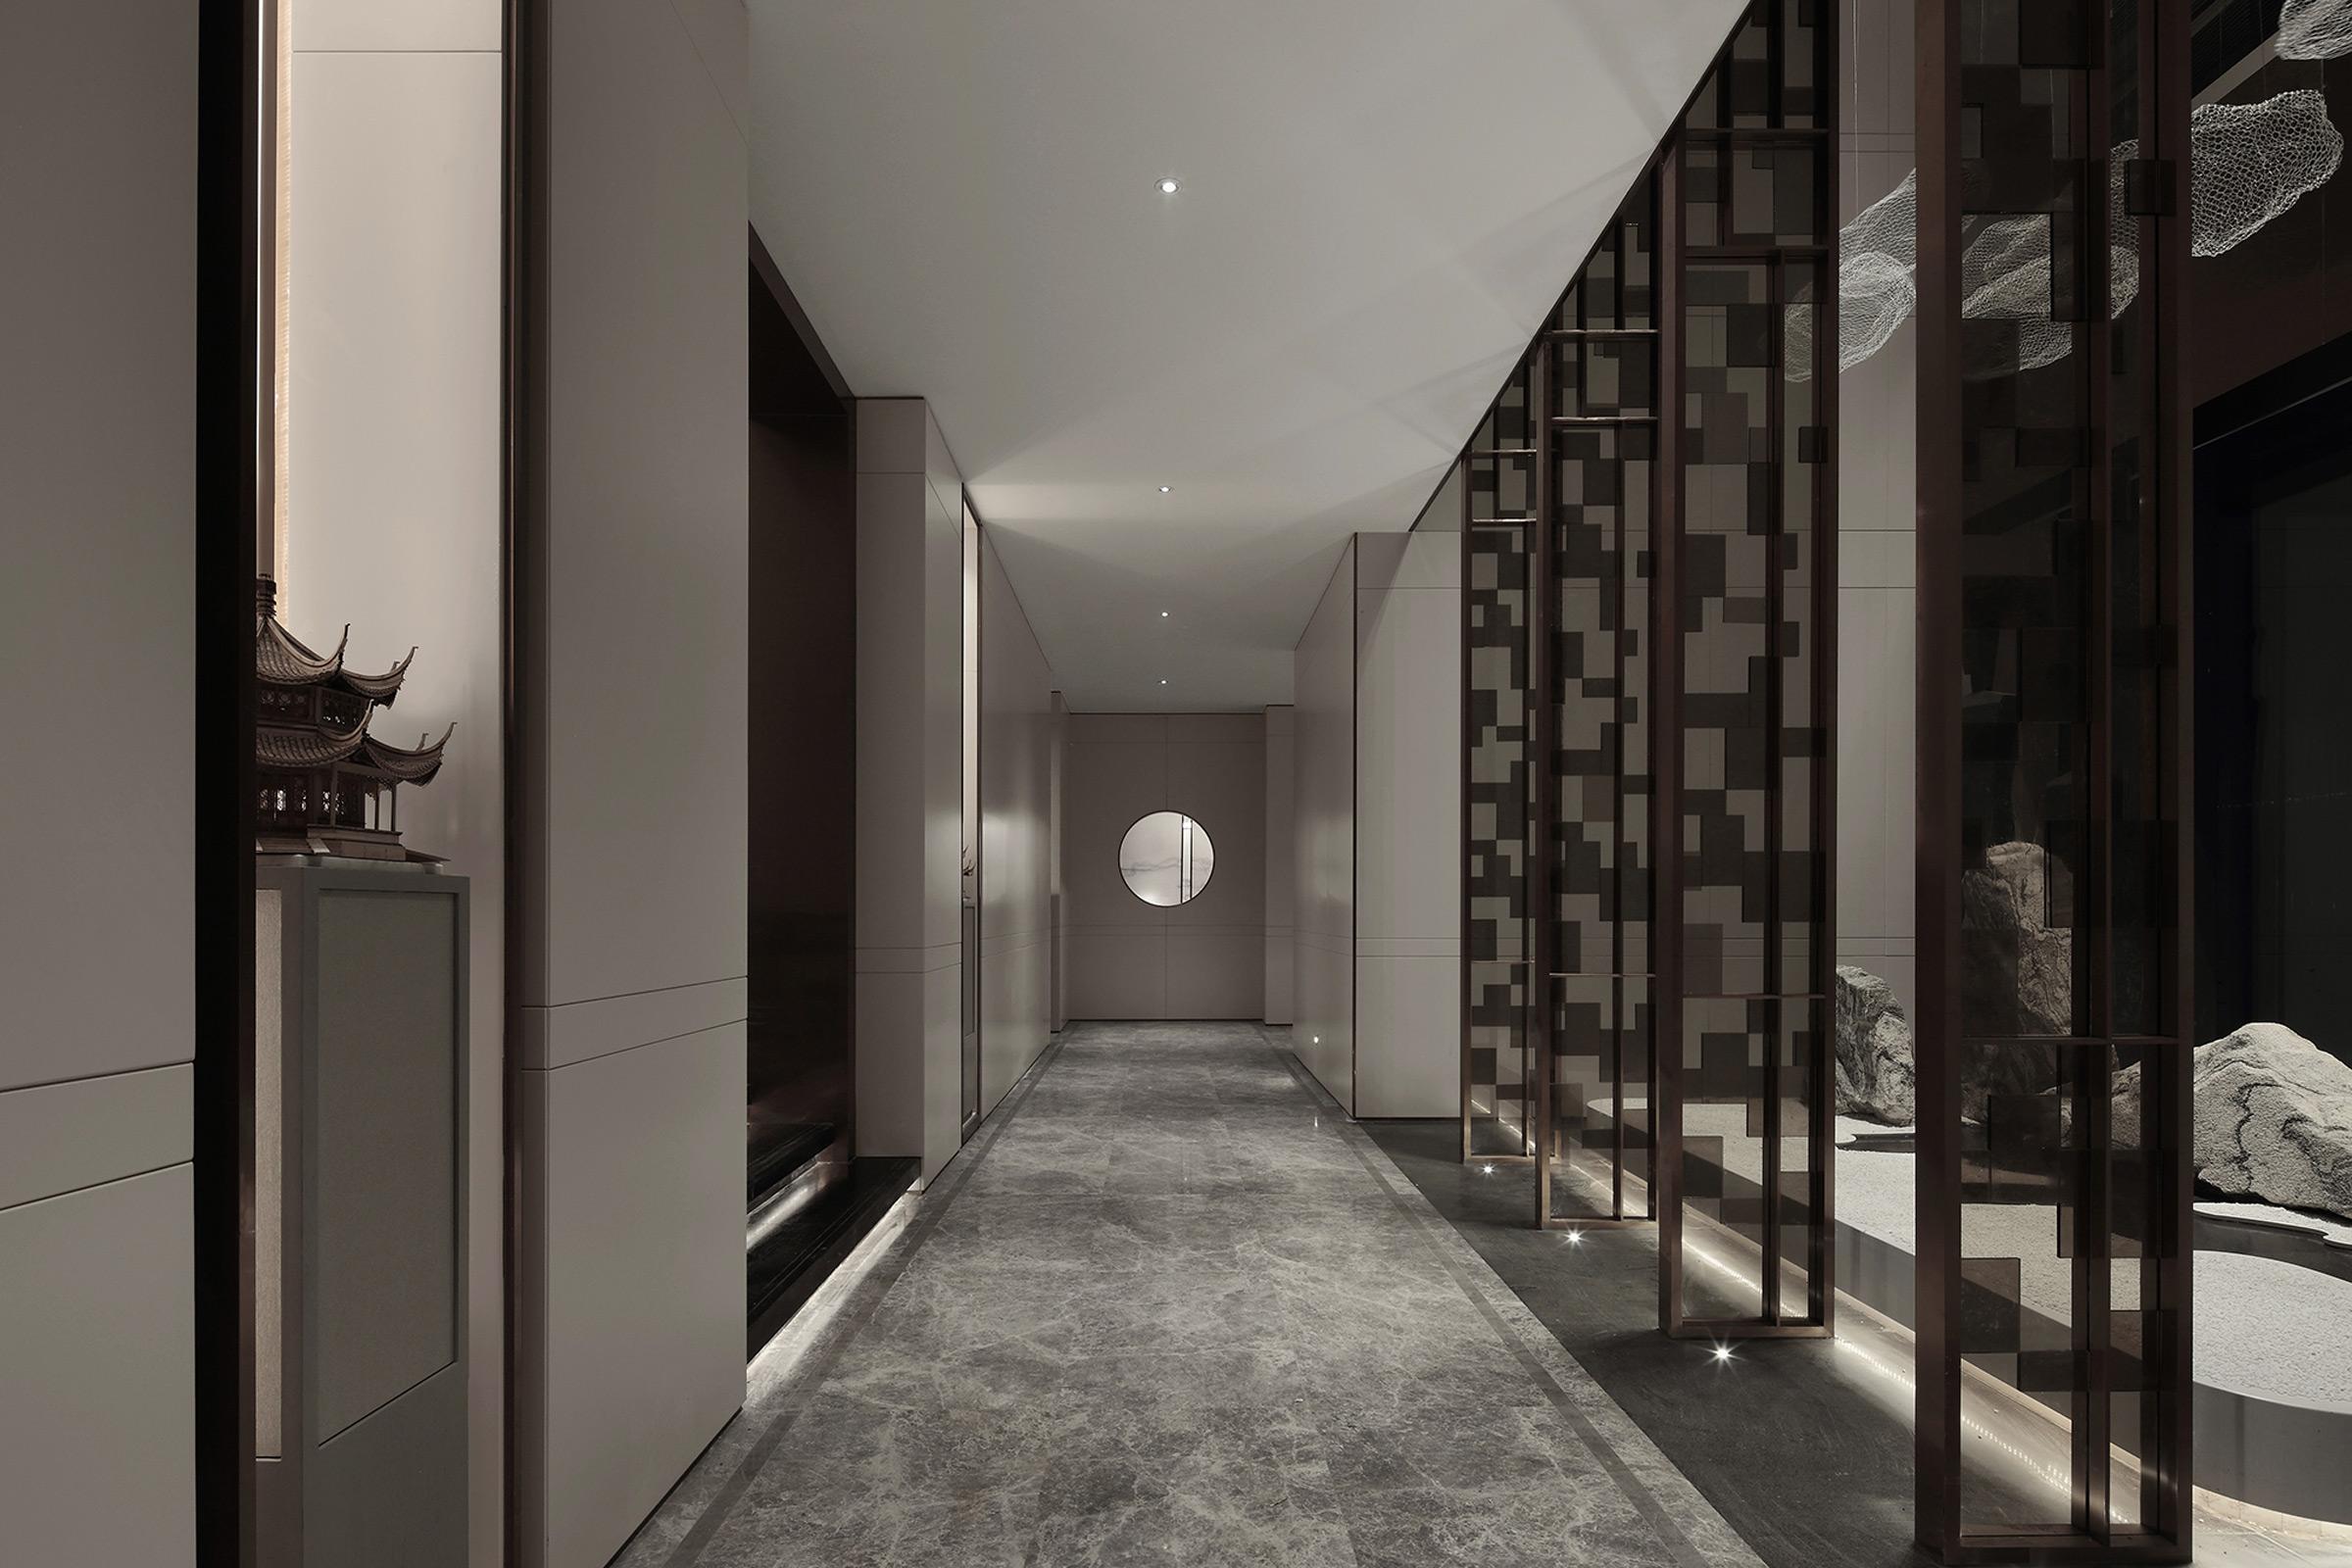 07-corridor.jpg